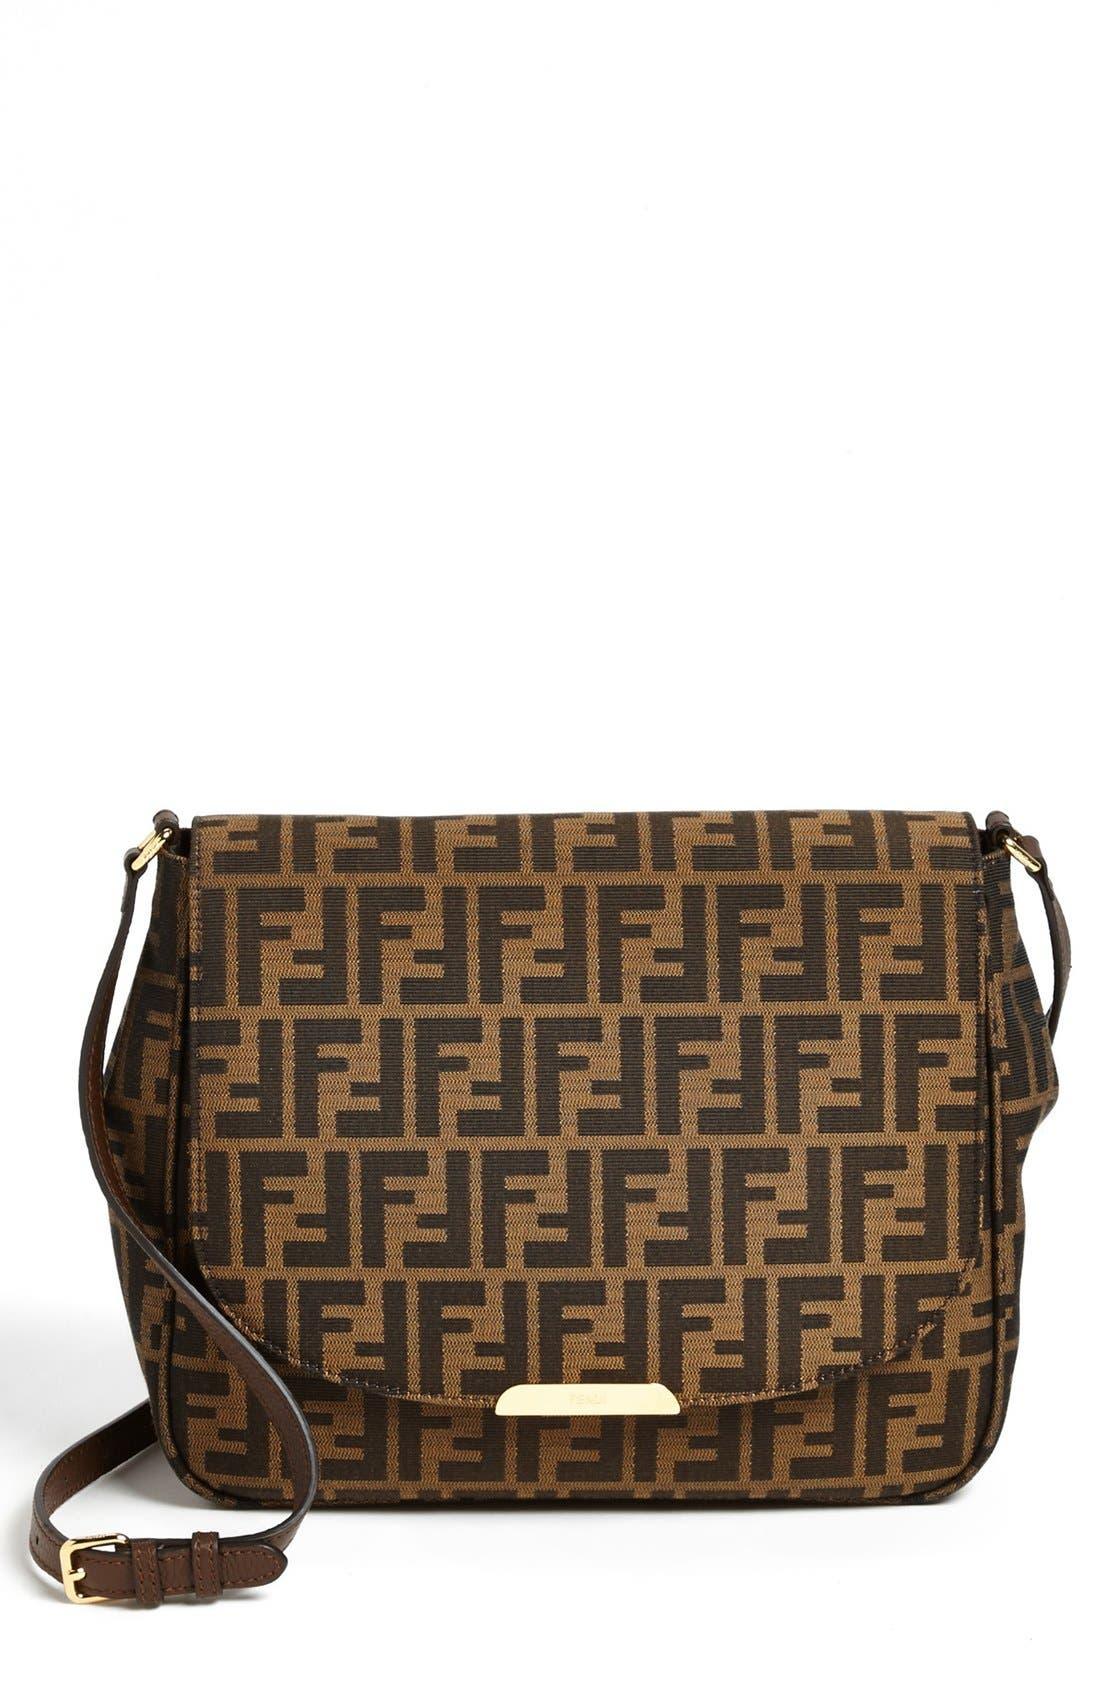 Main Image - Fendi 'Zucca - Large' Logo Jacquard Crossbody Bag